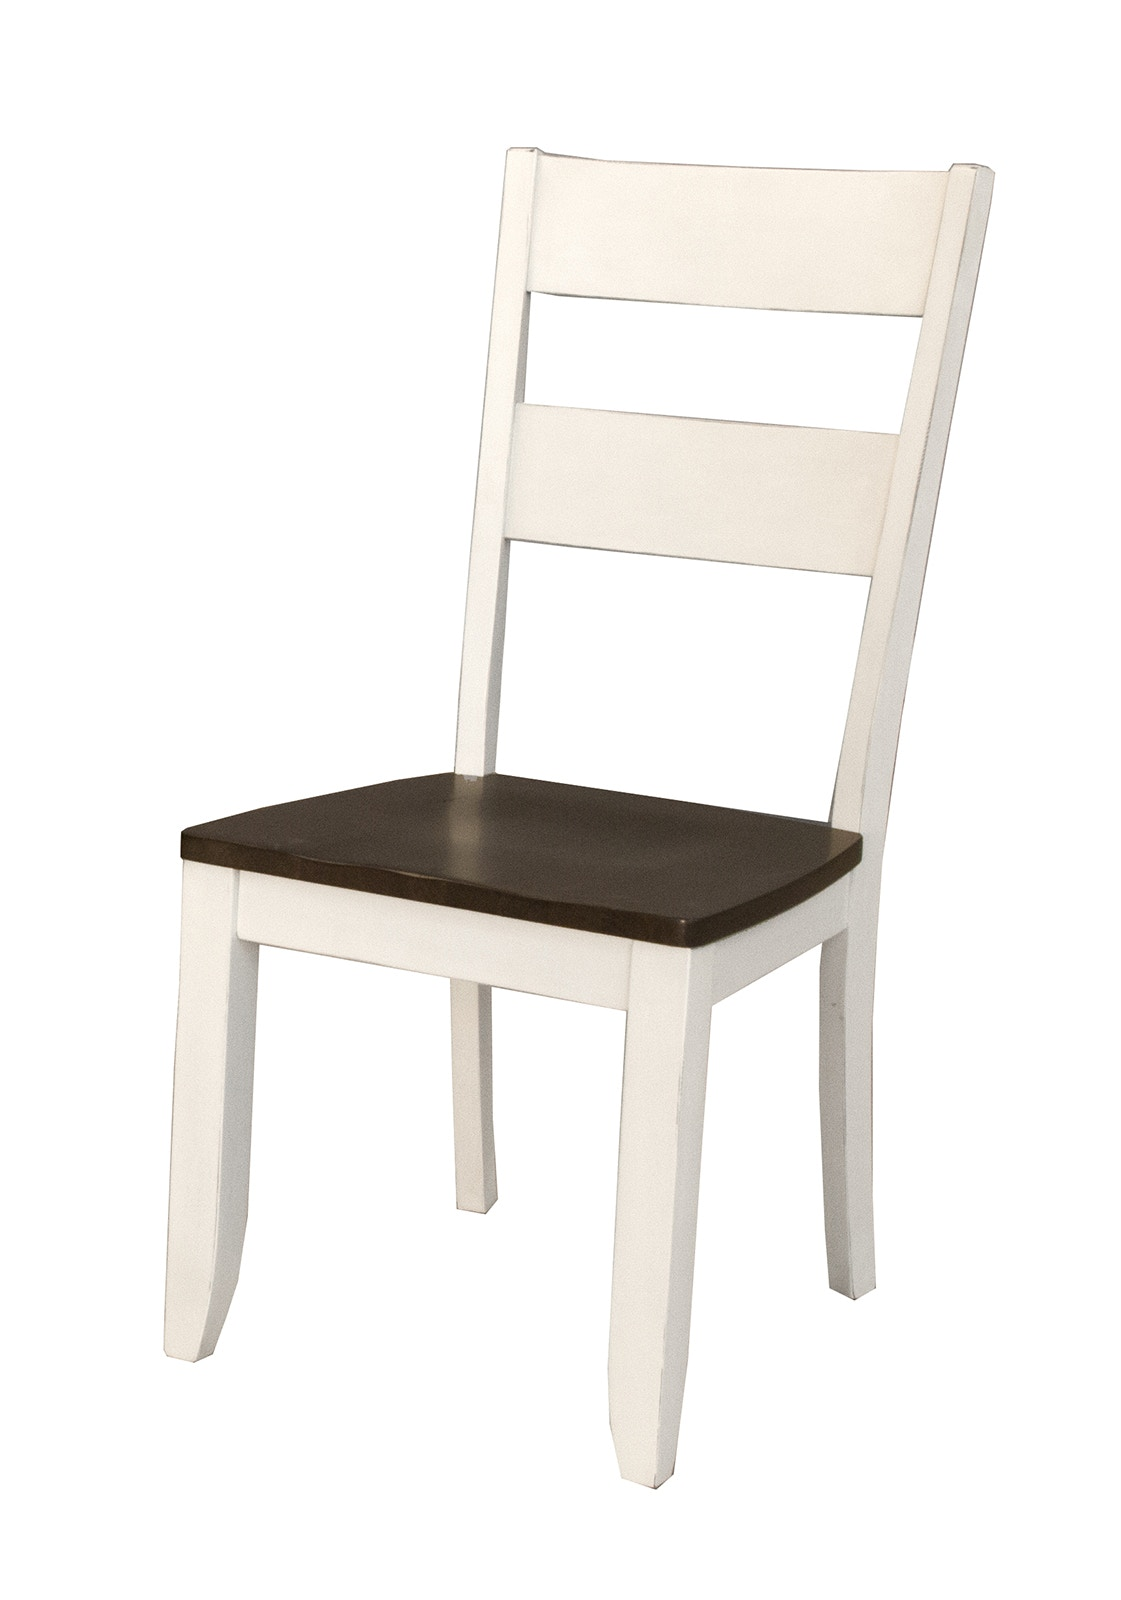 A America Mariposa Chalk Ladderback Chair 057992